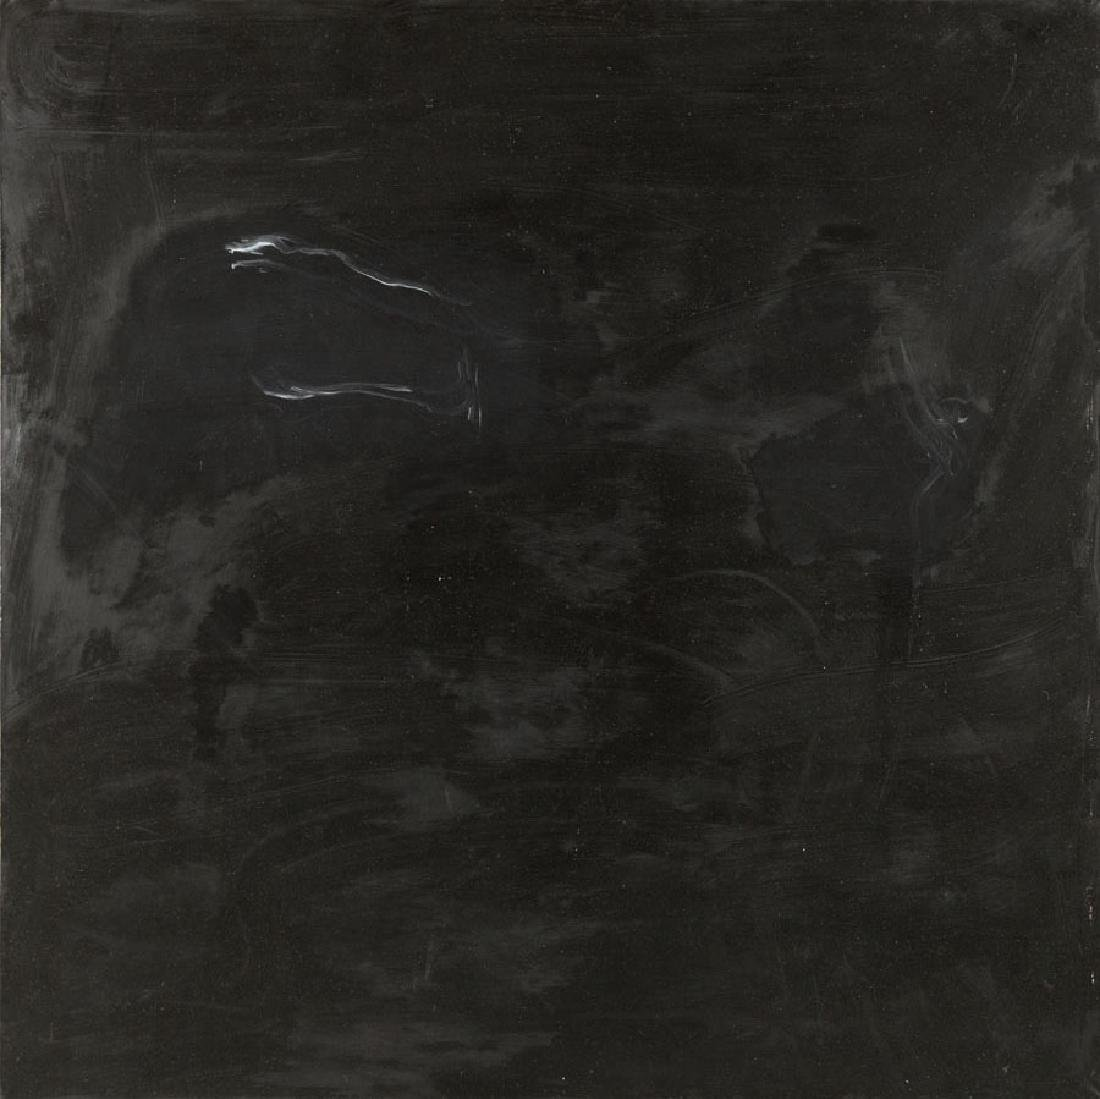 Wilhelm Sasnal (b. 1972) Untitled (1945), 2003